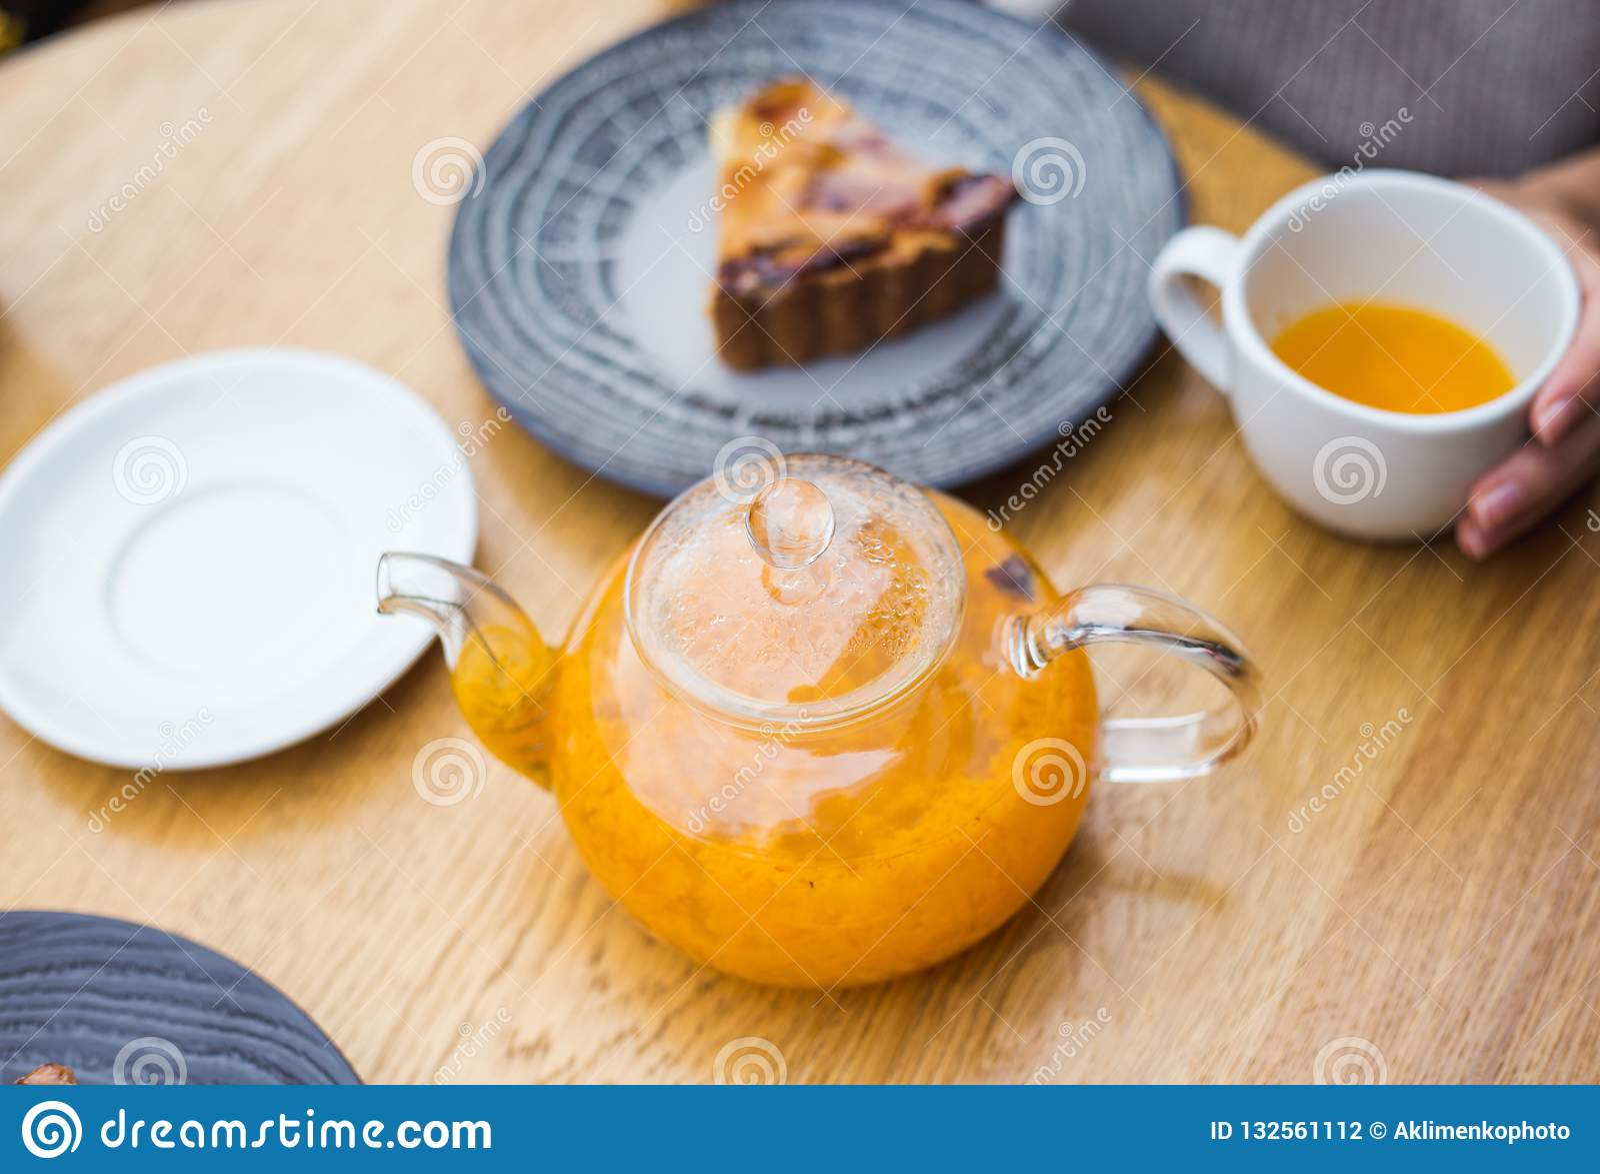 Teapot of orange tea and a pice of cake